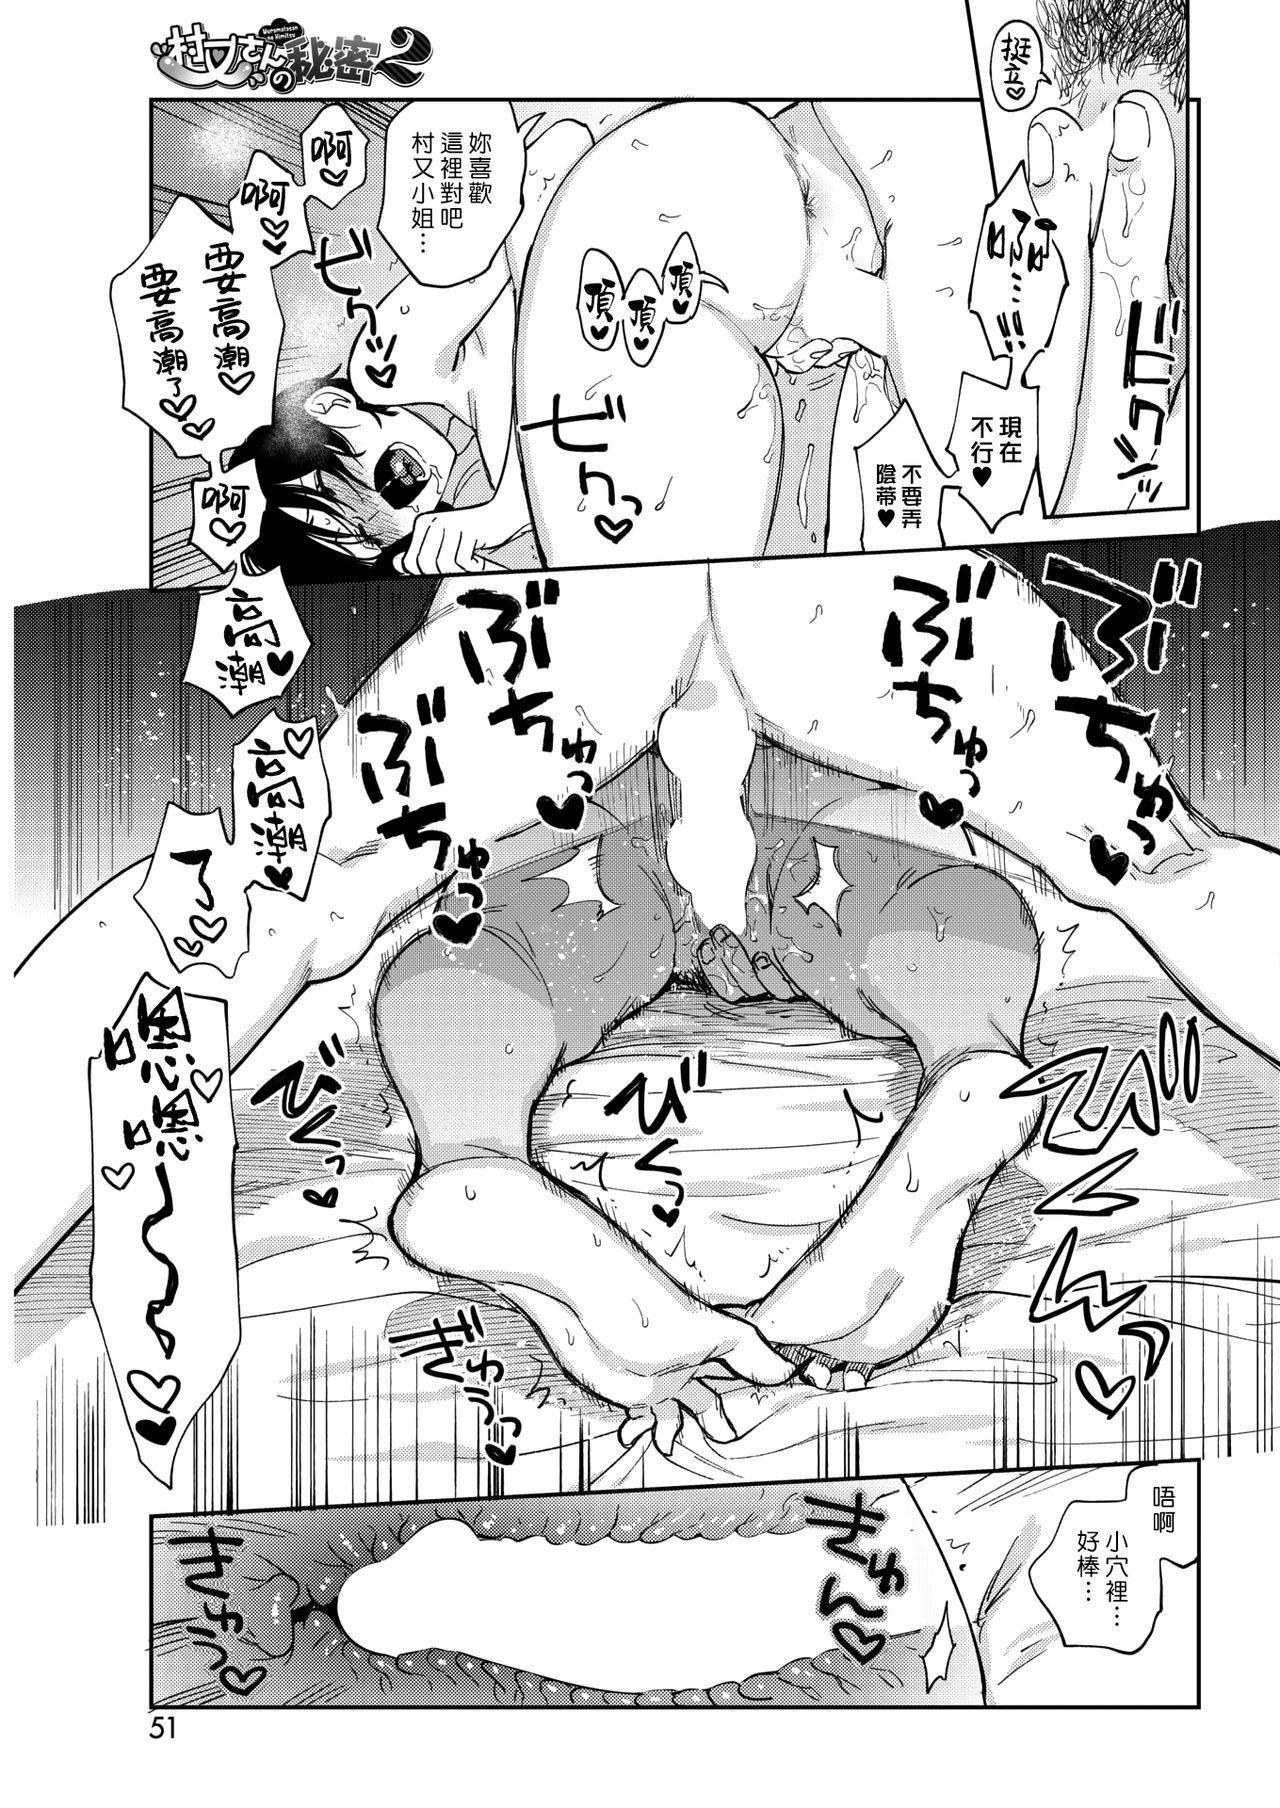 Muramata-san no Himitsu 2 | 村又小姐的秘密 2 20